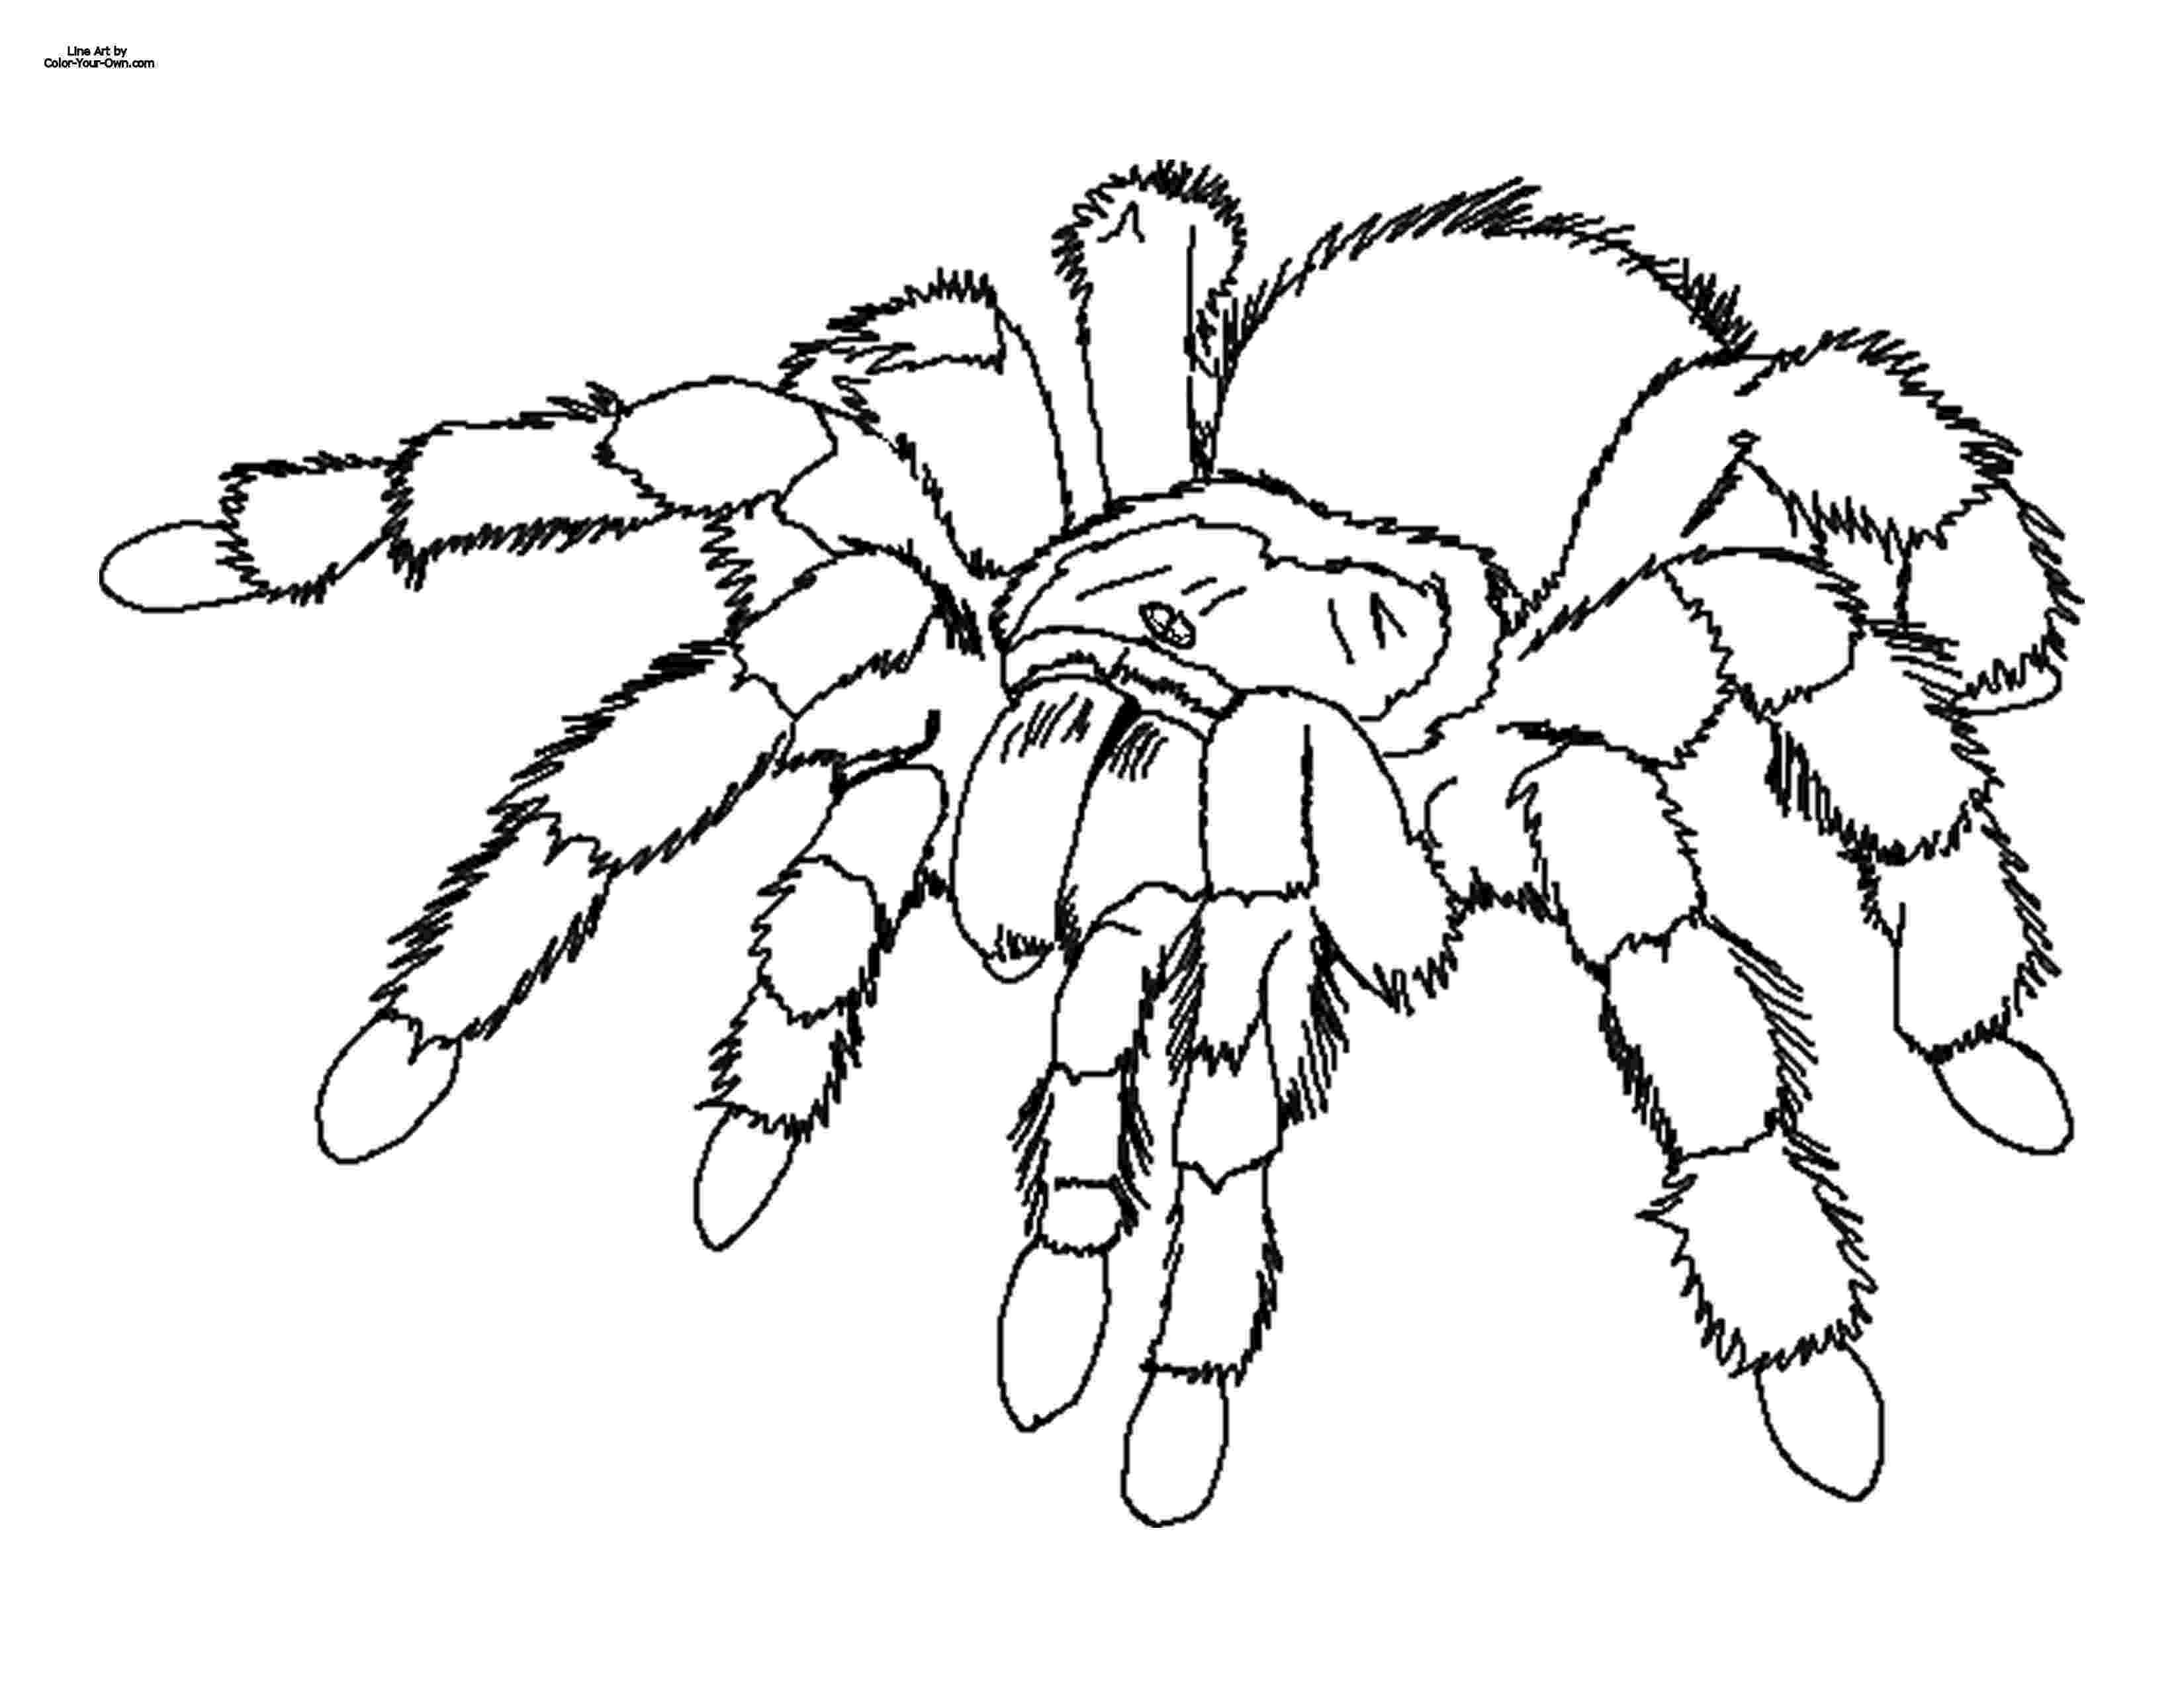 tarantula coloring page giant tarantula spider coloring sheet page tarantula coloring